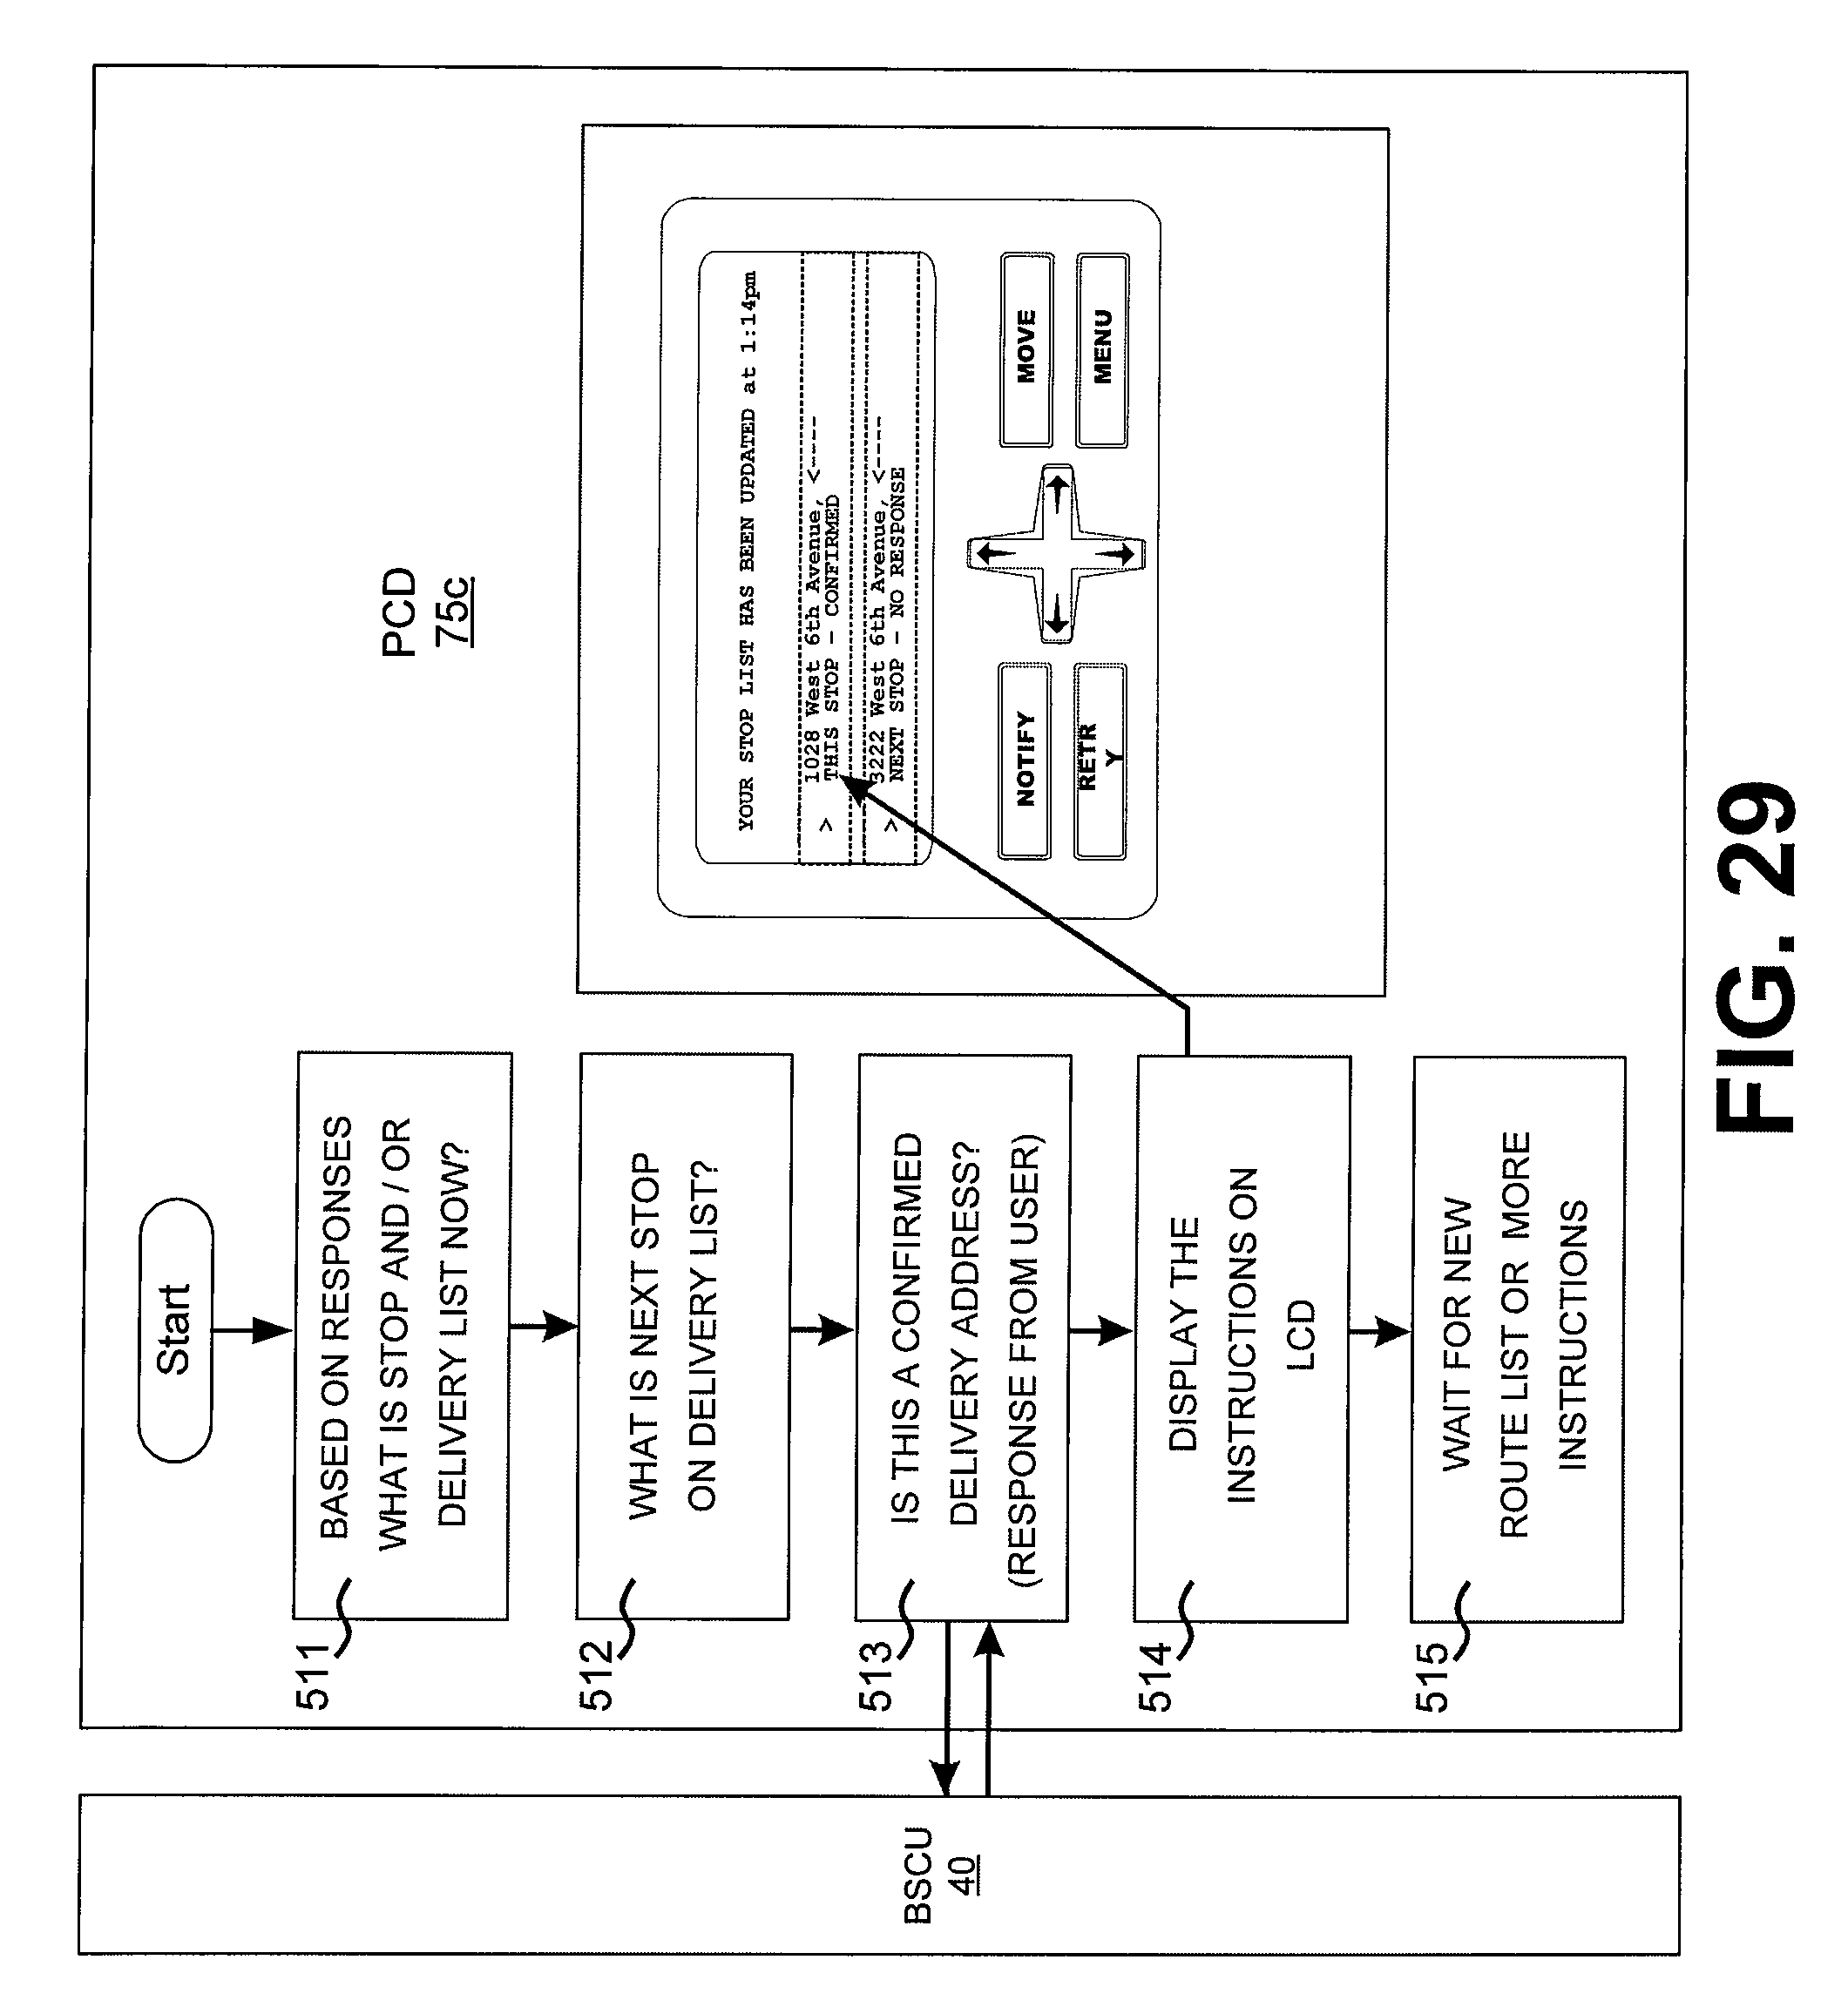 Patent Us 7528742 B2 Pdc Spa Wiring Diagram Litigations